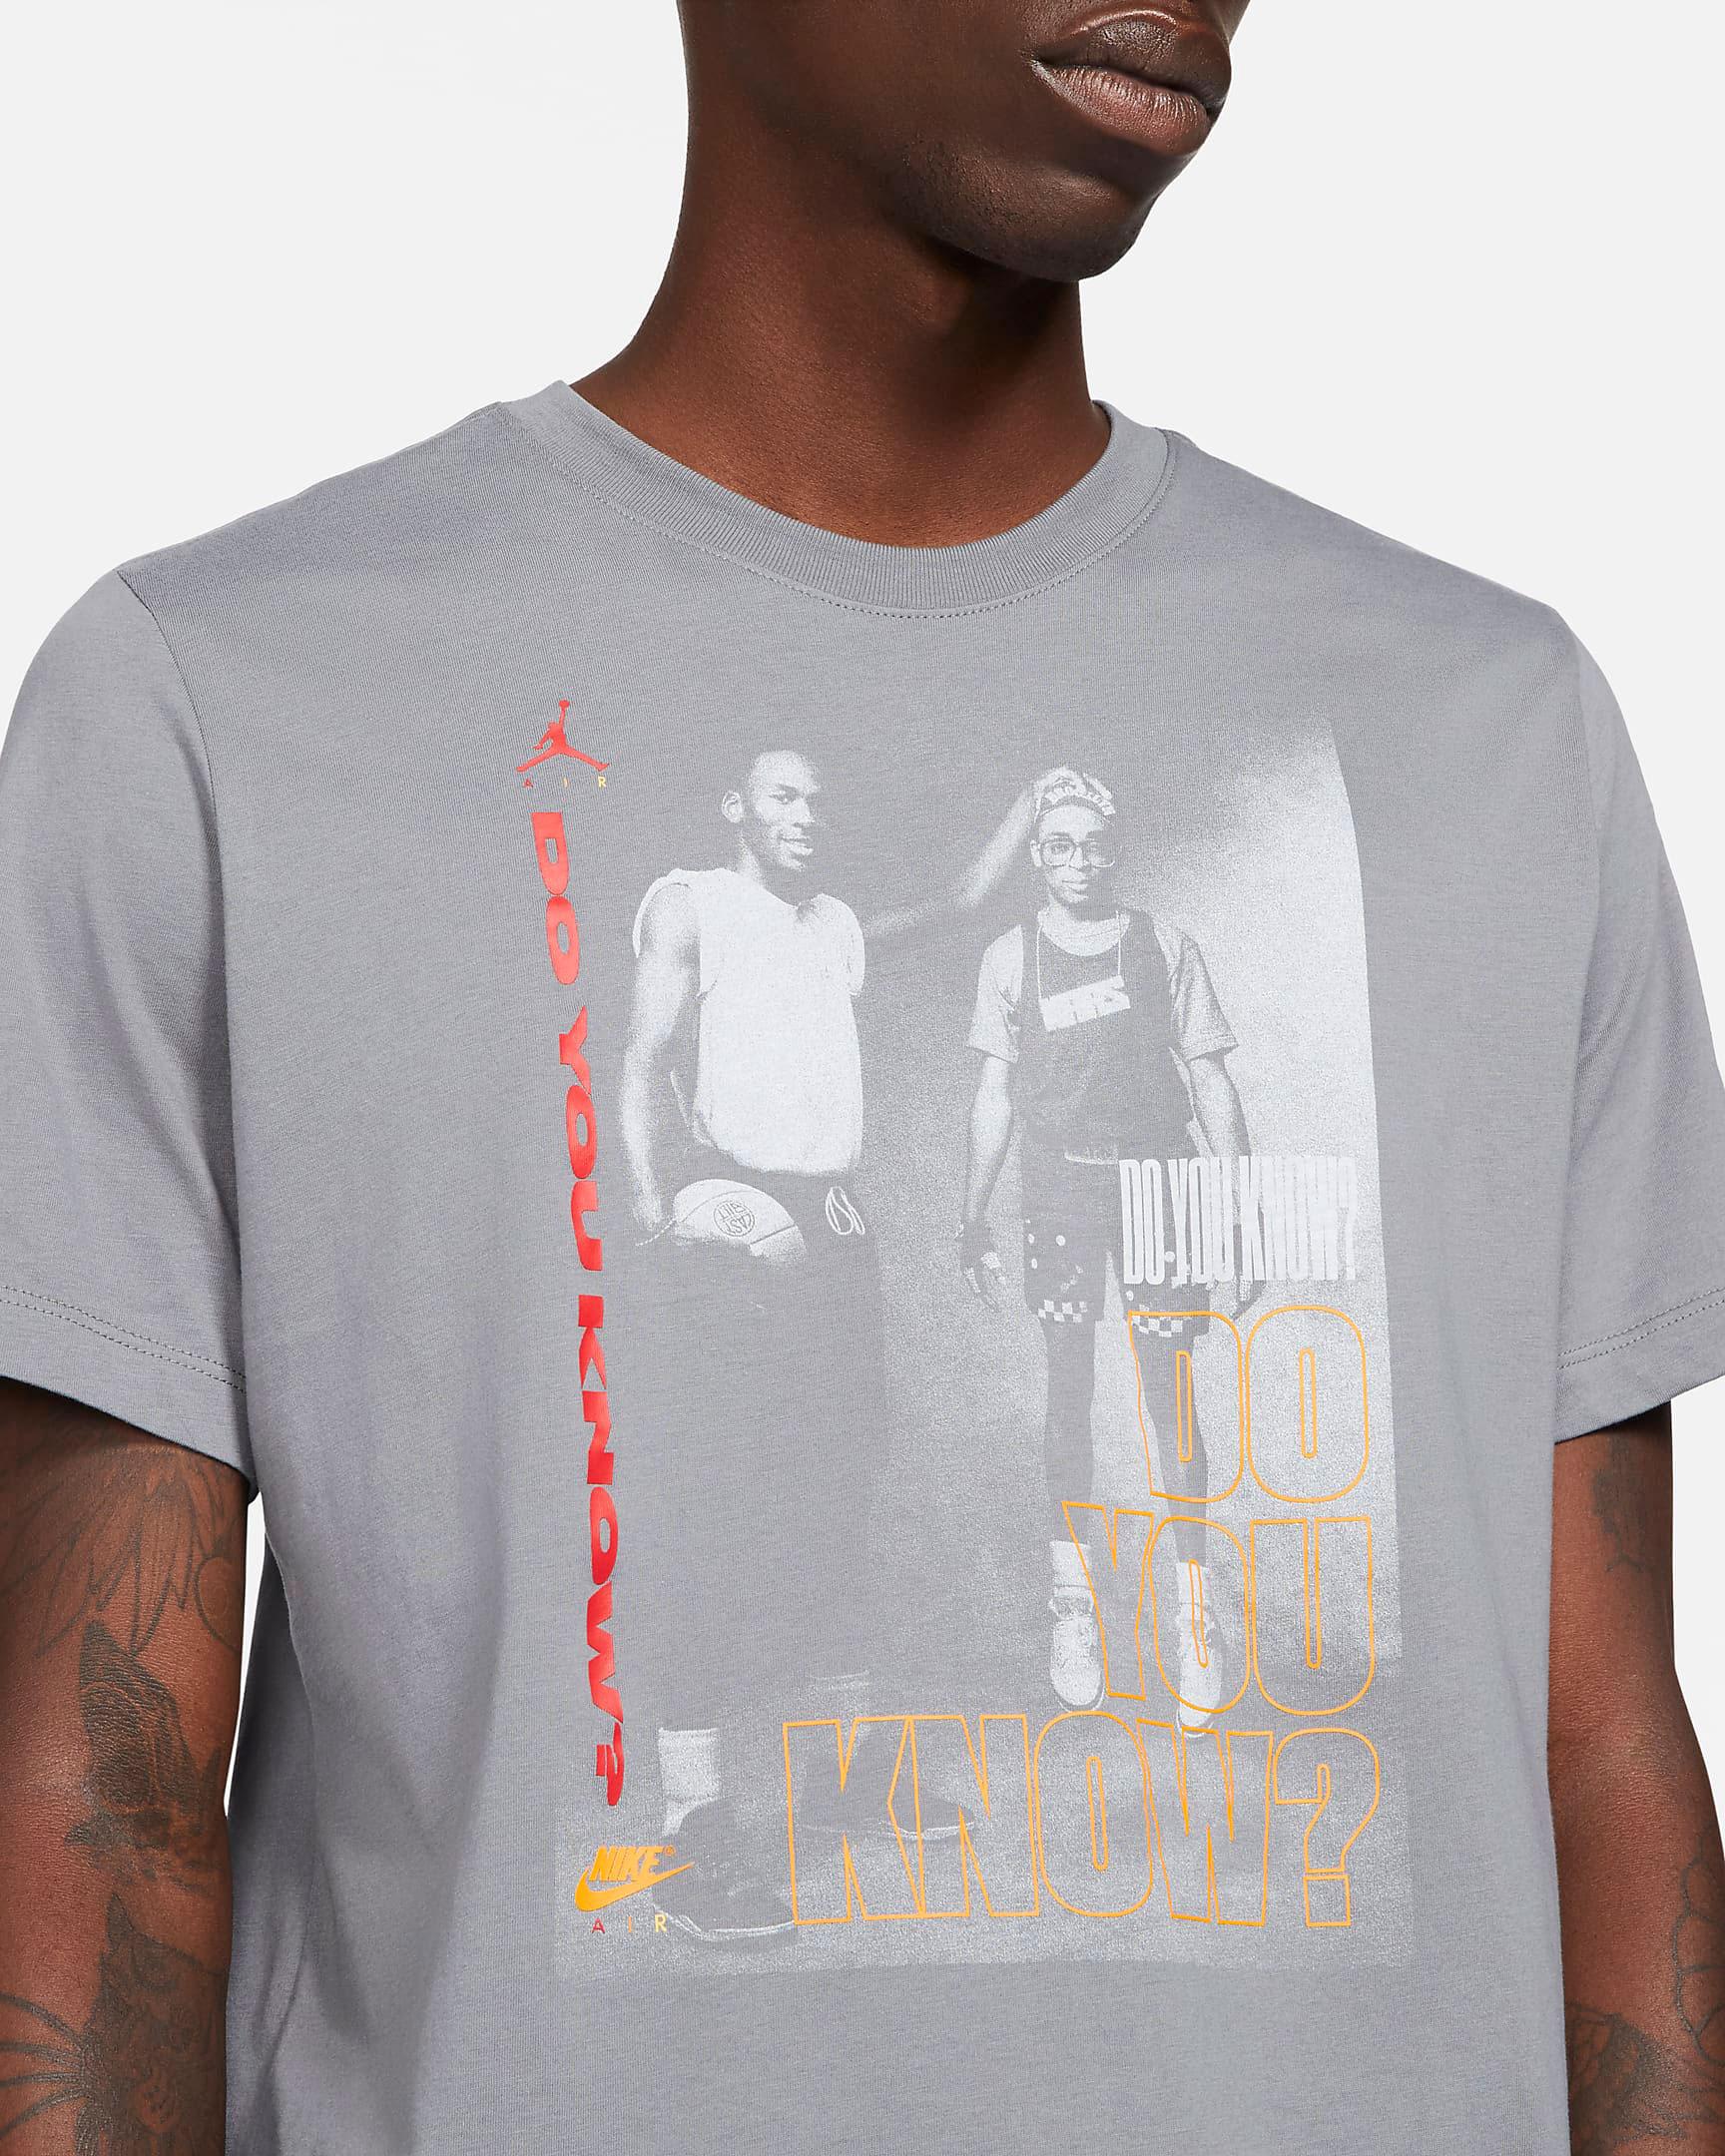 air-jordan-3-cool-grey-retro-2021-shirt